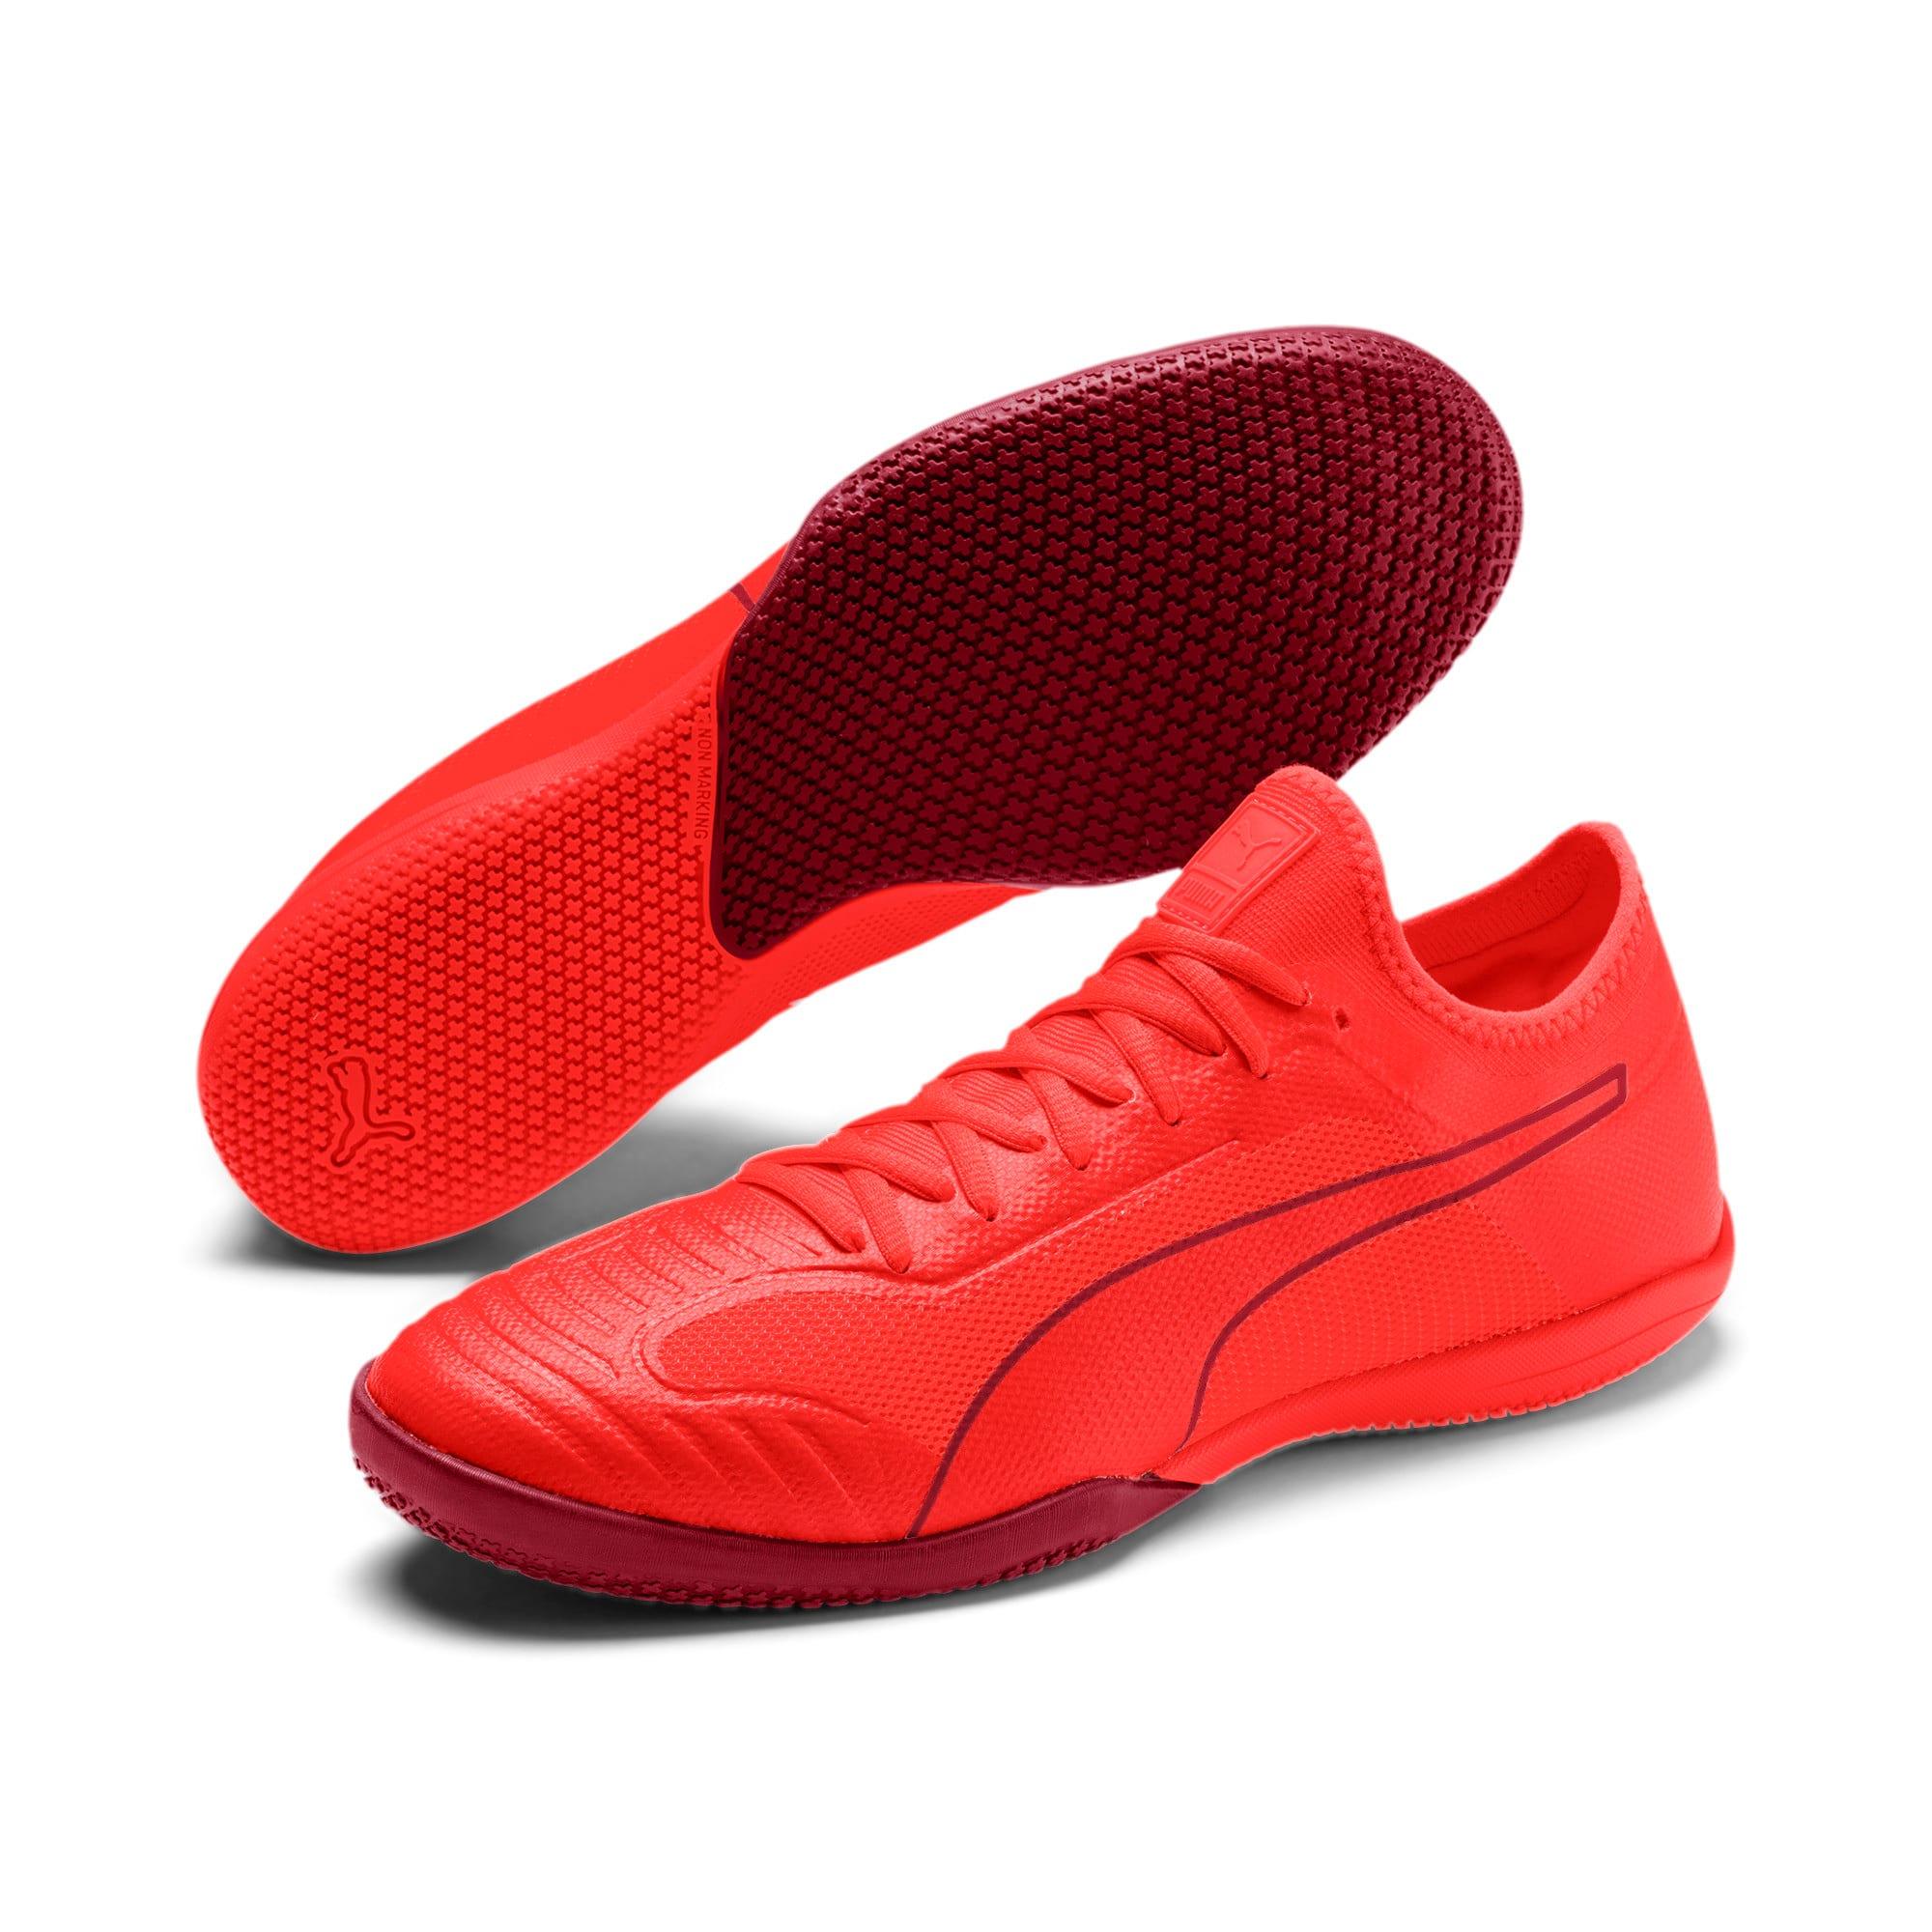 Thumbnail 2 of 365 Sala 1 Men's Soccer Shoes, Nrgy Red-Rhubarb, medium